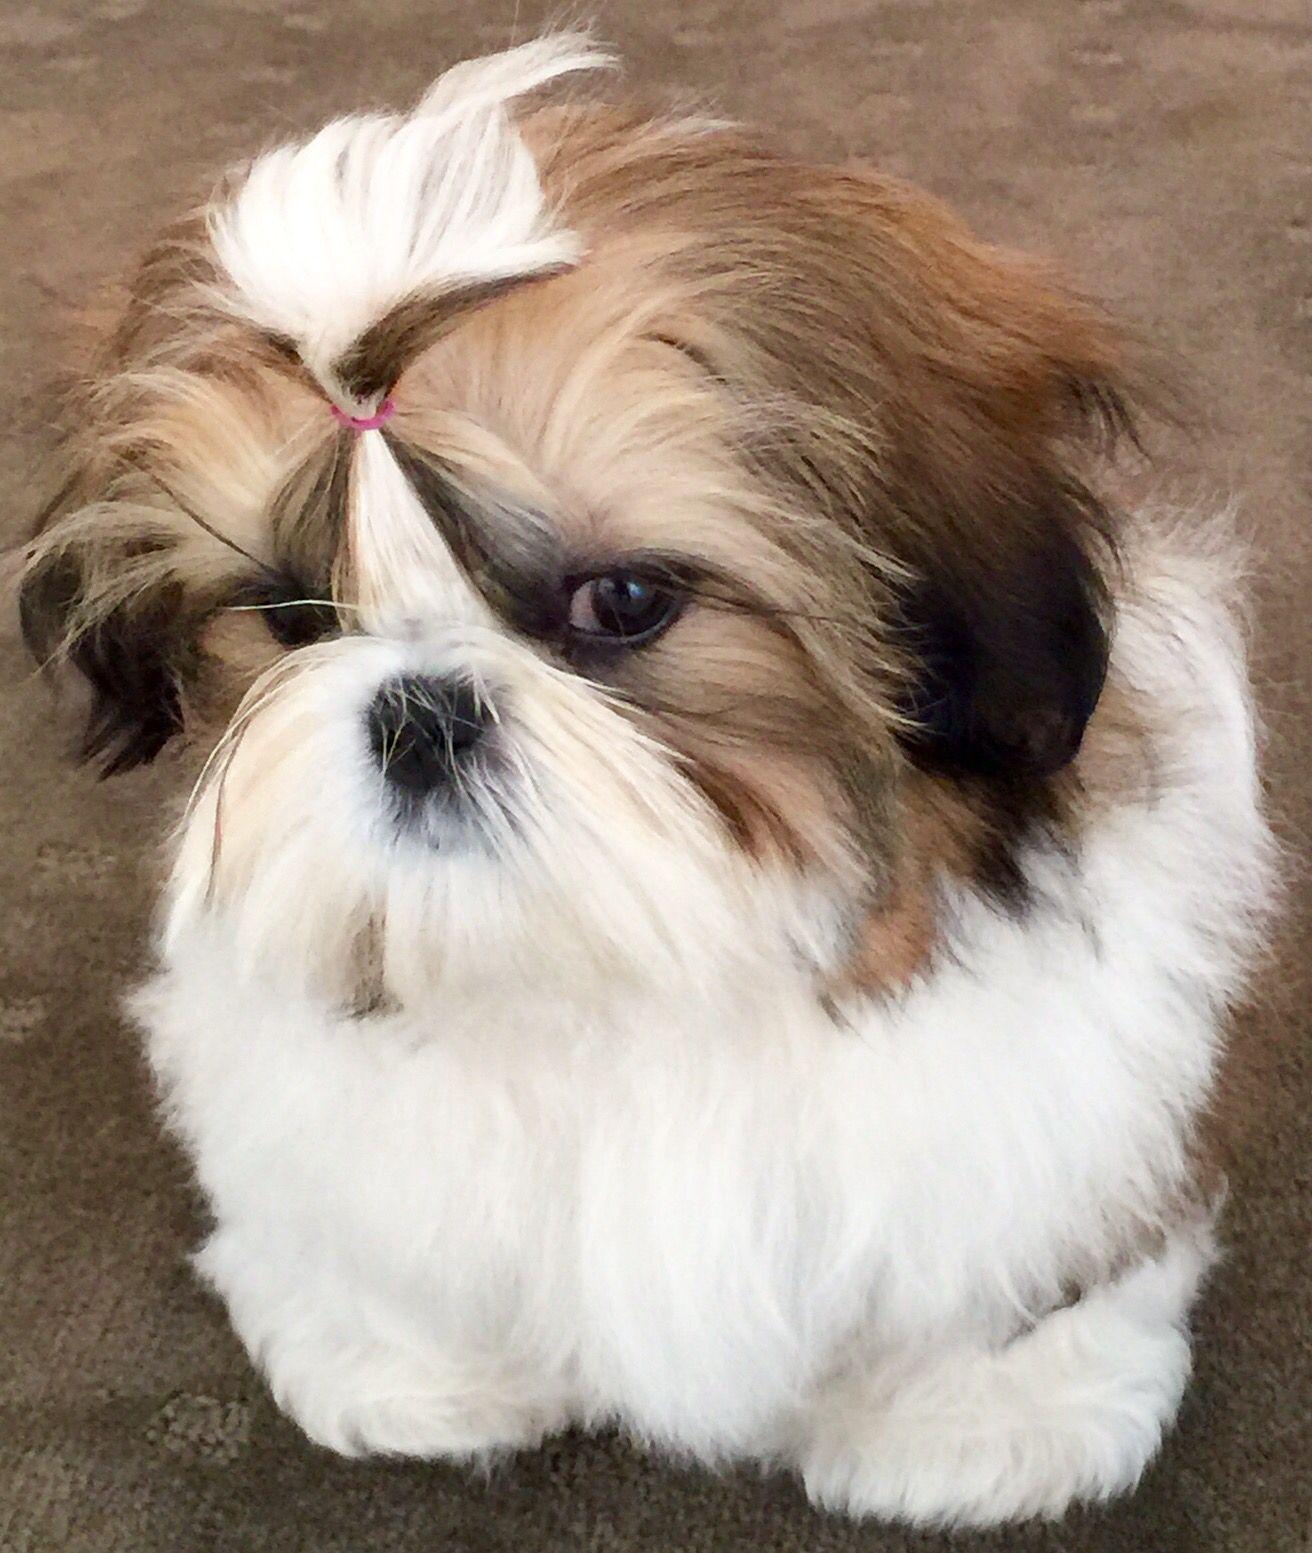 Shih Tzu Audrey Shih Tzu Puppy Shih Tzu Haircuts Shih Tzu